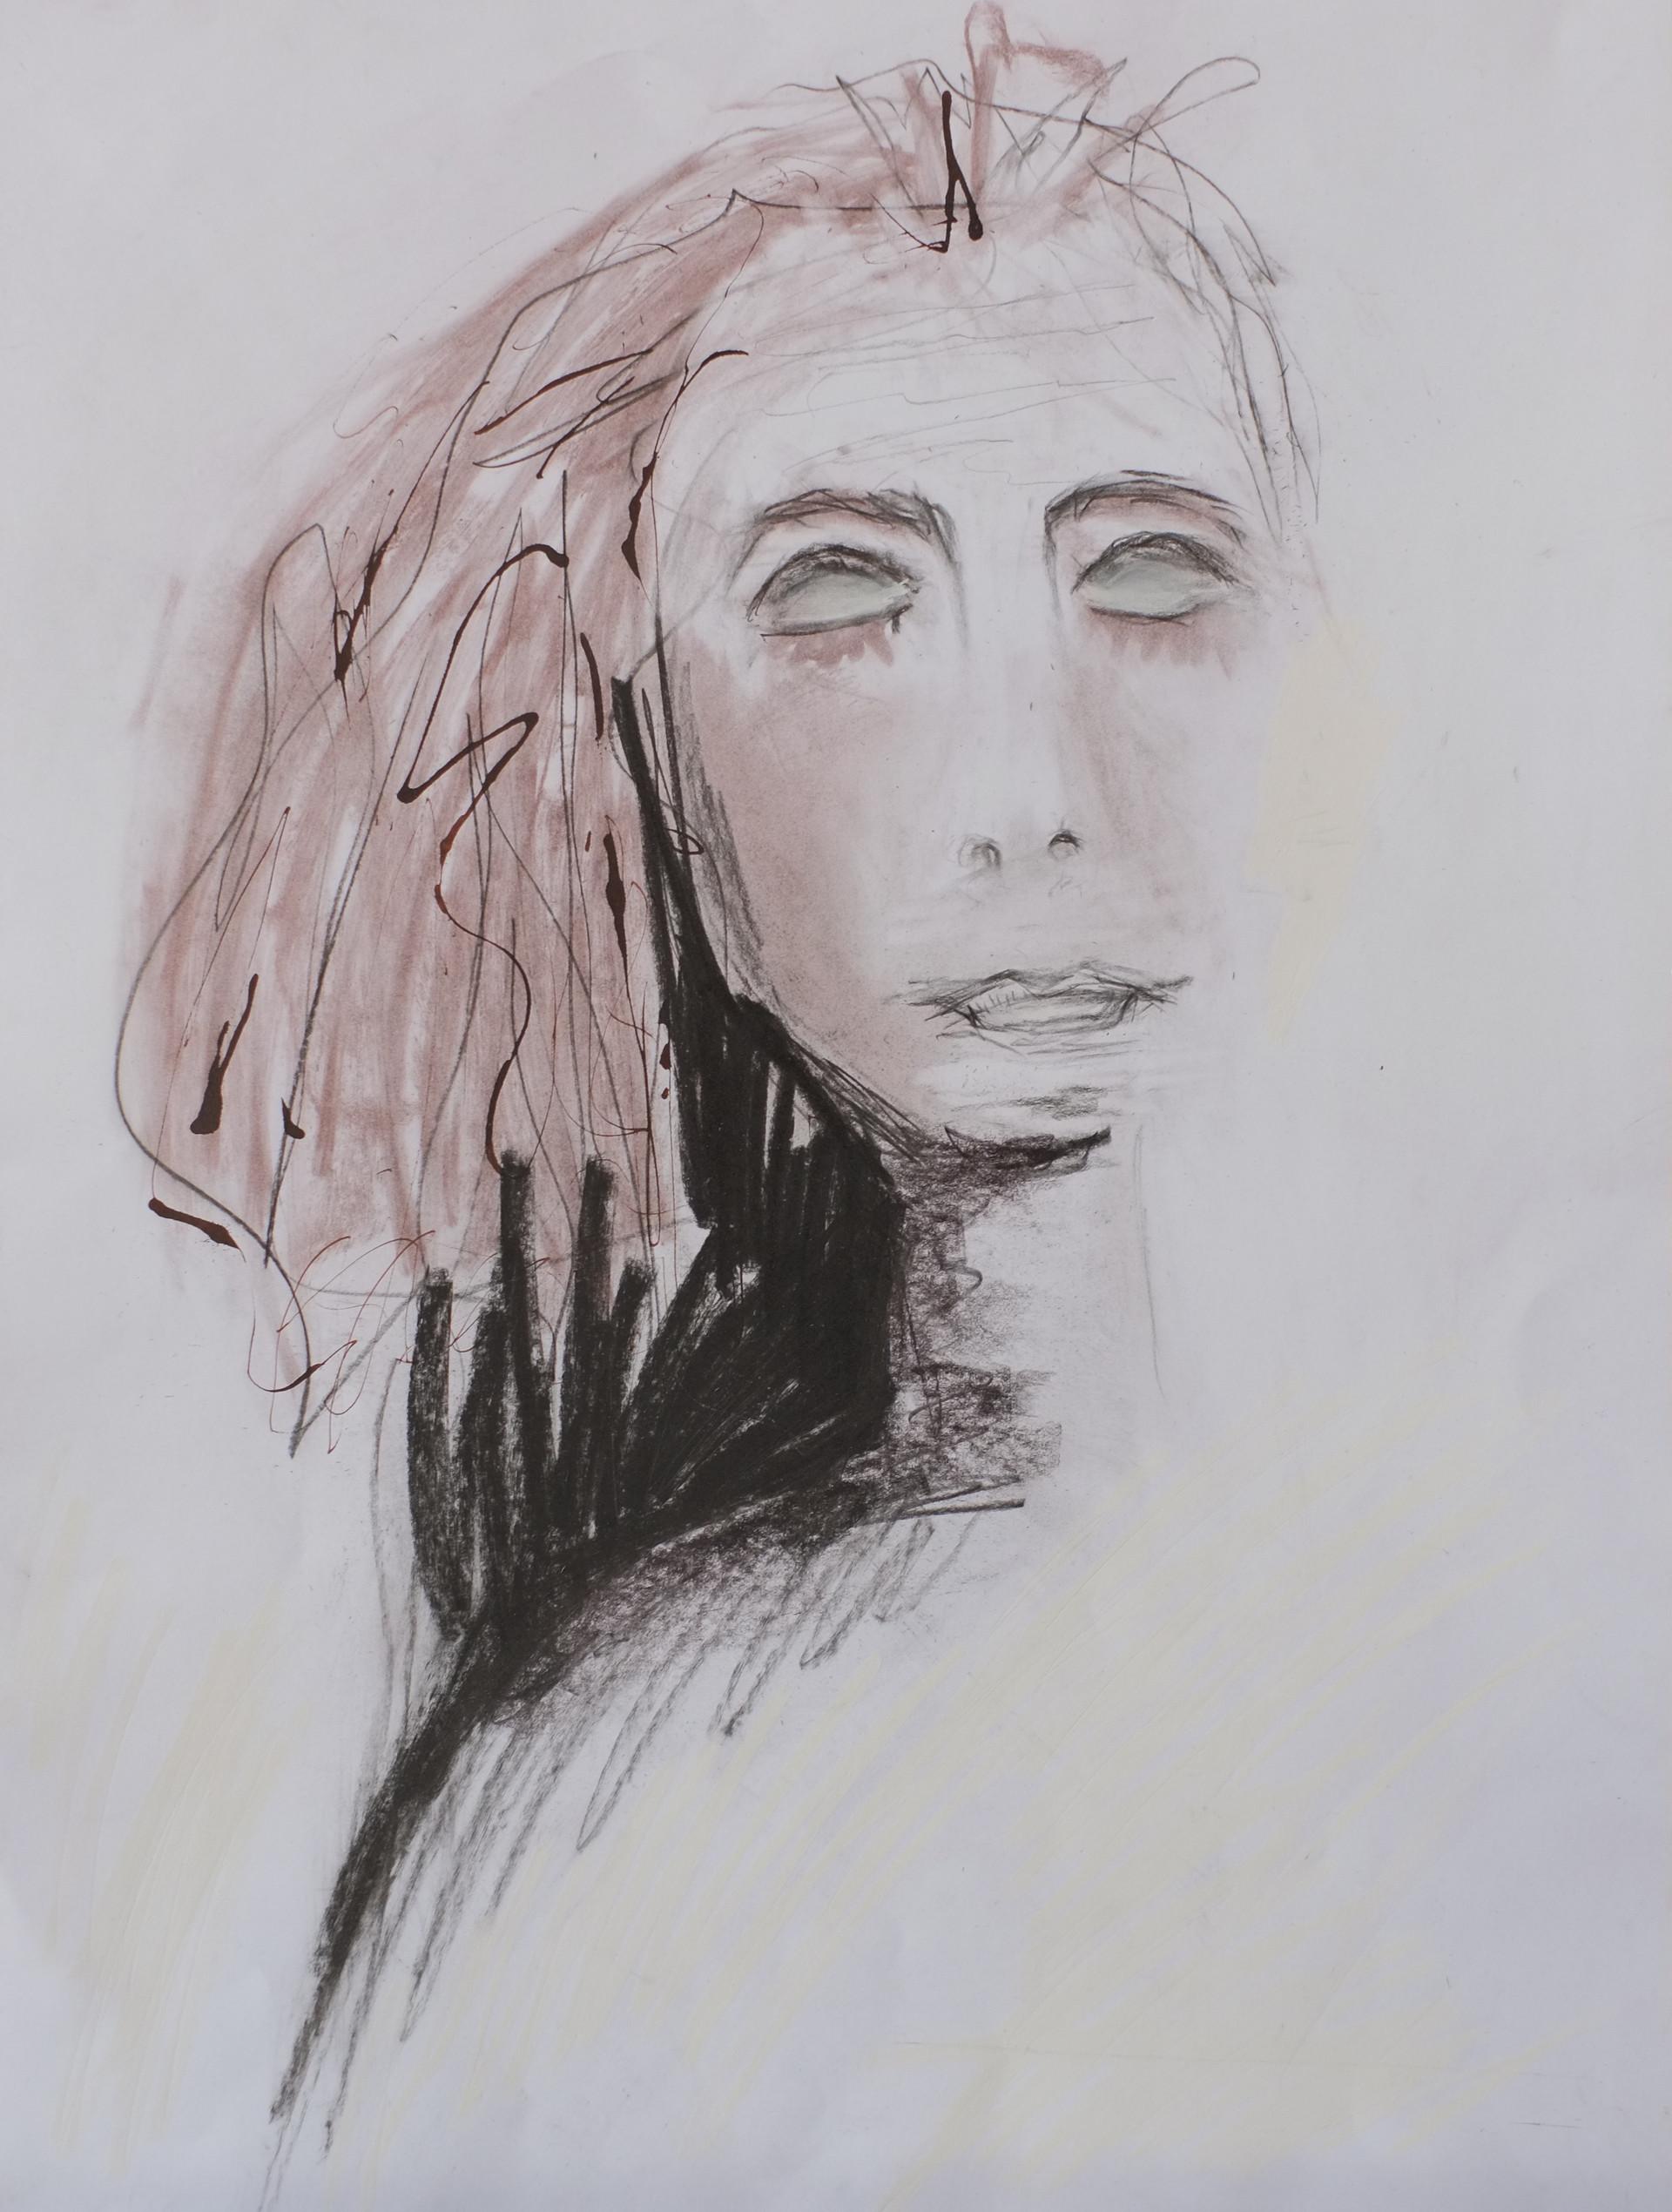 Louiselle Linteau